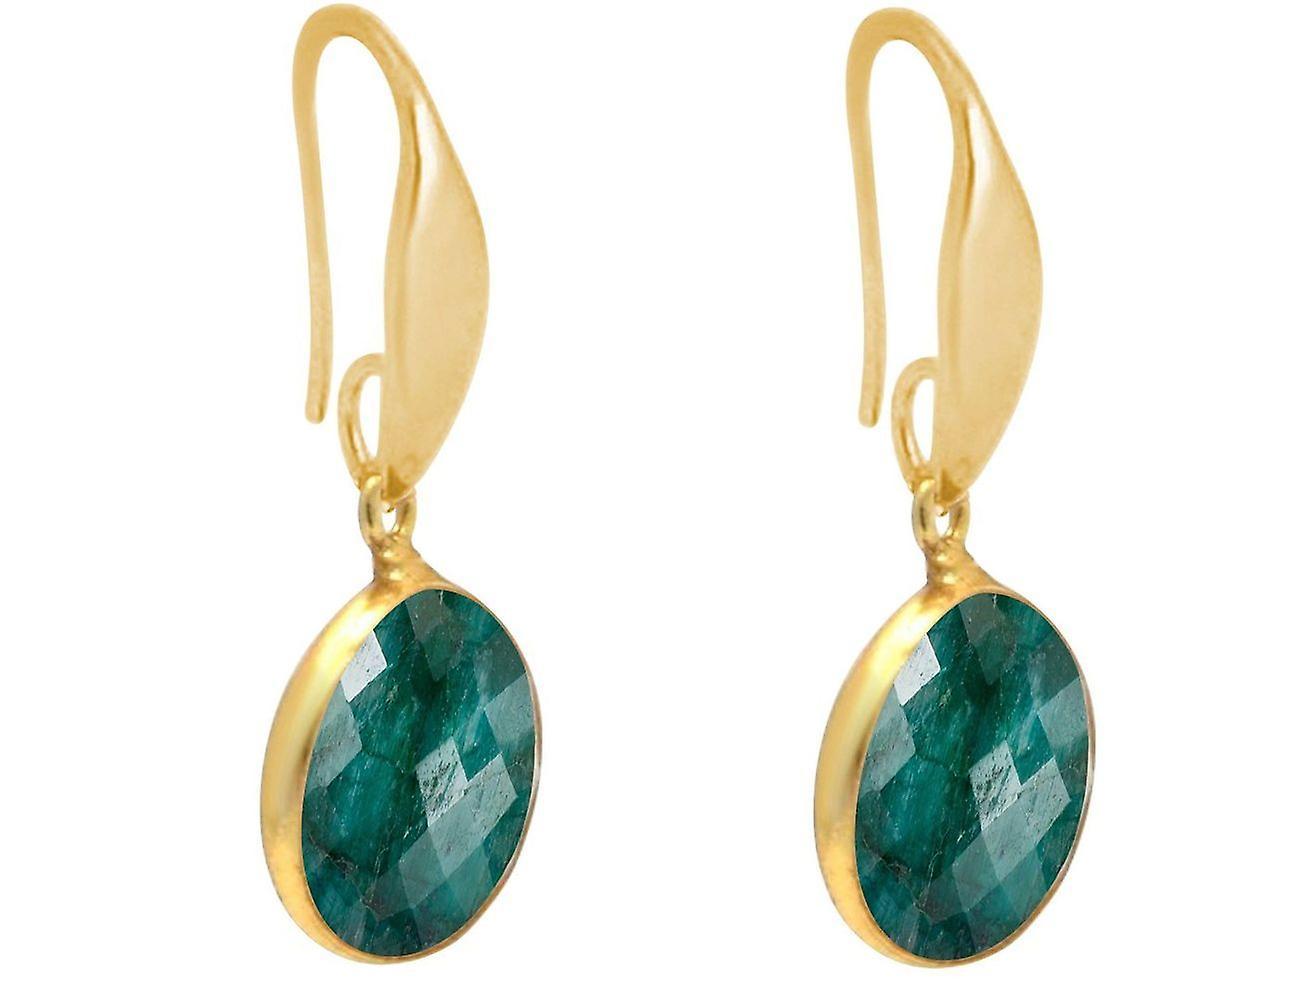 Gemshine Ohrringe Smaragd Edelstein Tropfen in 925 Silber, vergoldet oder rose